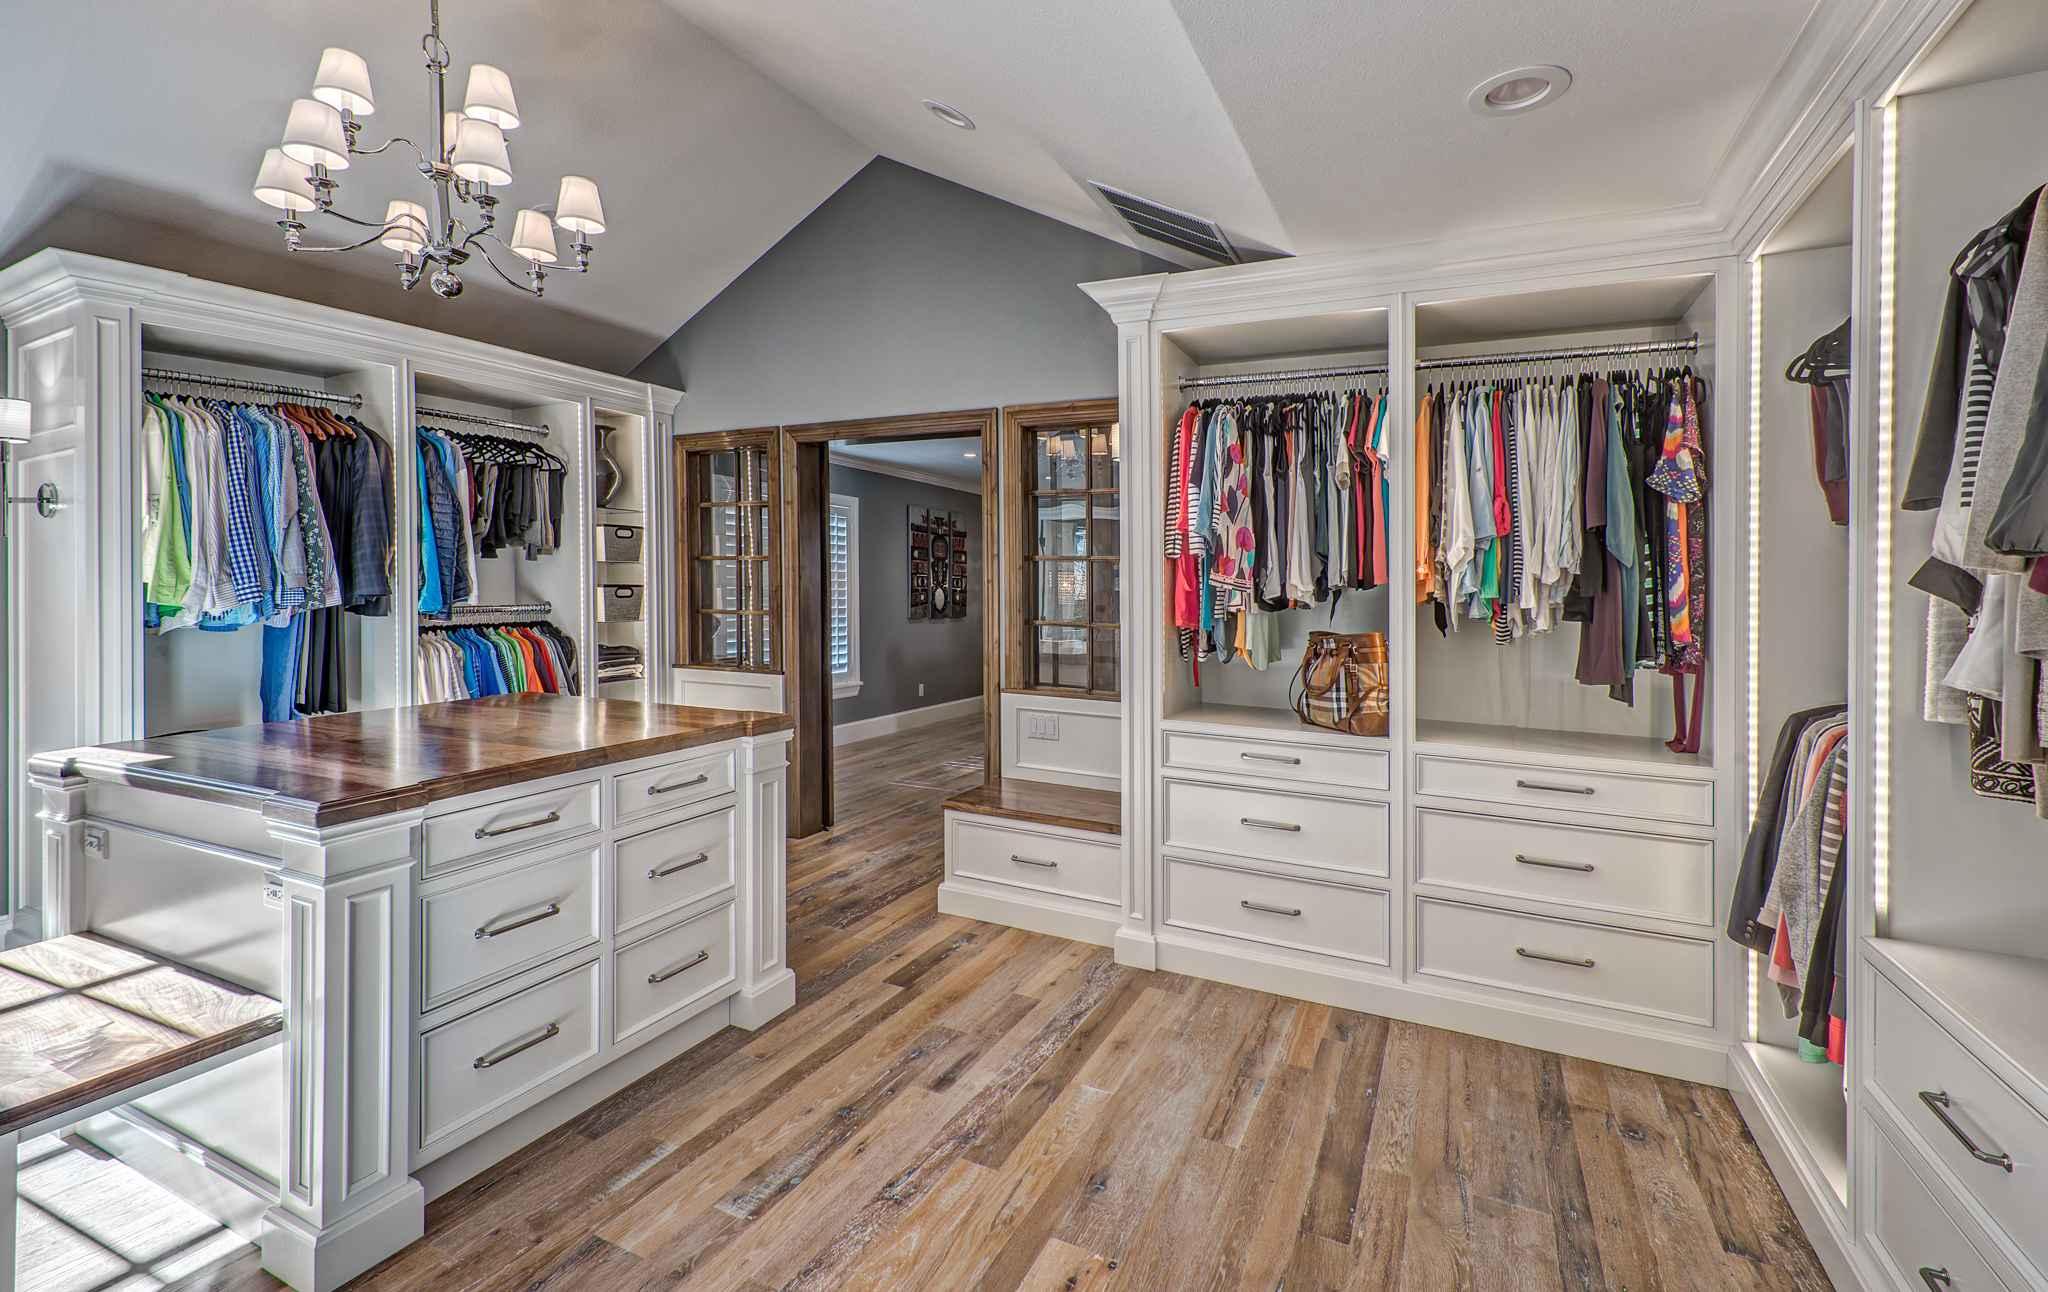 gray and white — sanctuary kitchen and bath design-11.jpg